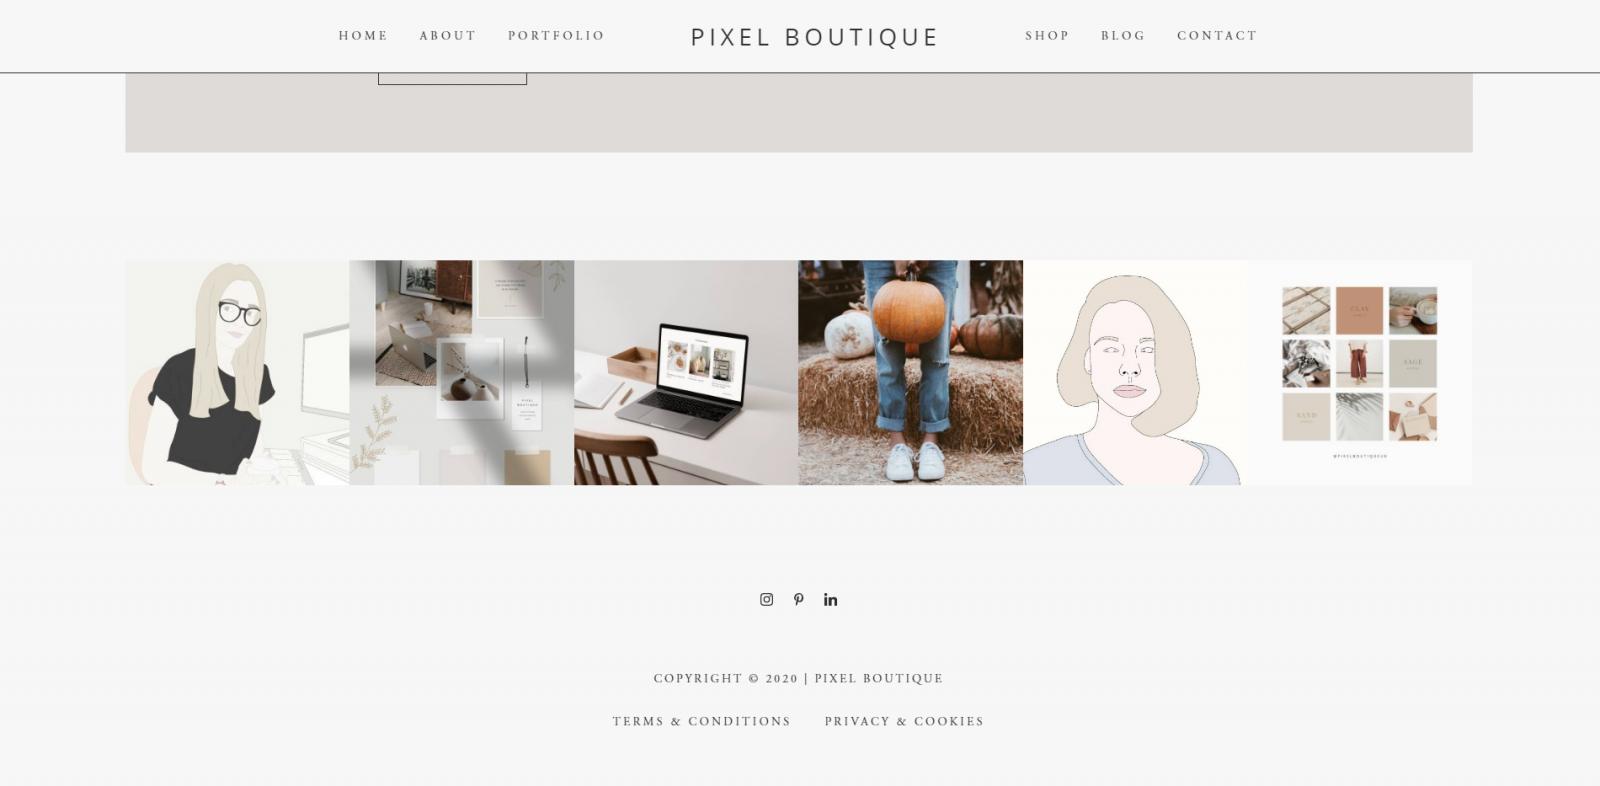 Pixel Boutique | WordPress Tutorials | Add Instagram Feed to Website